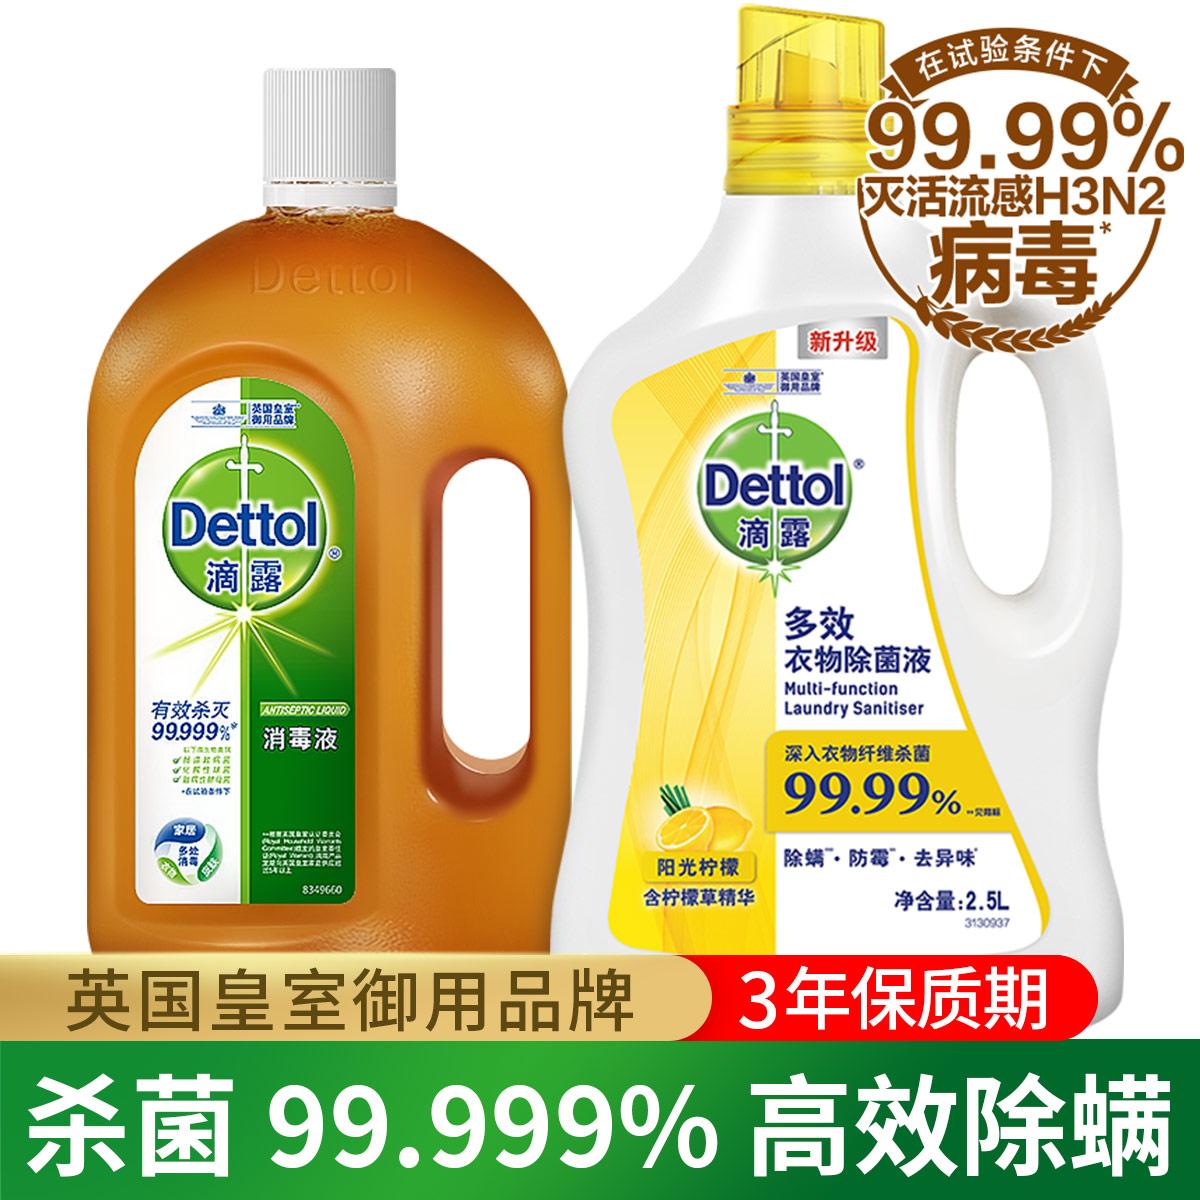 Dettol 【 杀菌除螨】滴露消毒液1.2L+多效除菌液2.5L 长效7天抑菌防霉